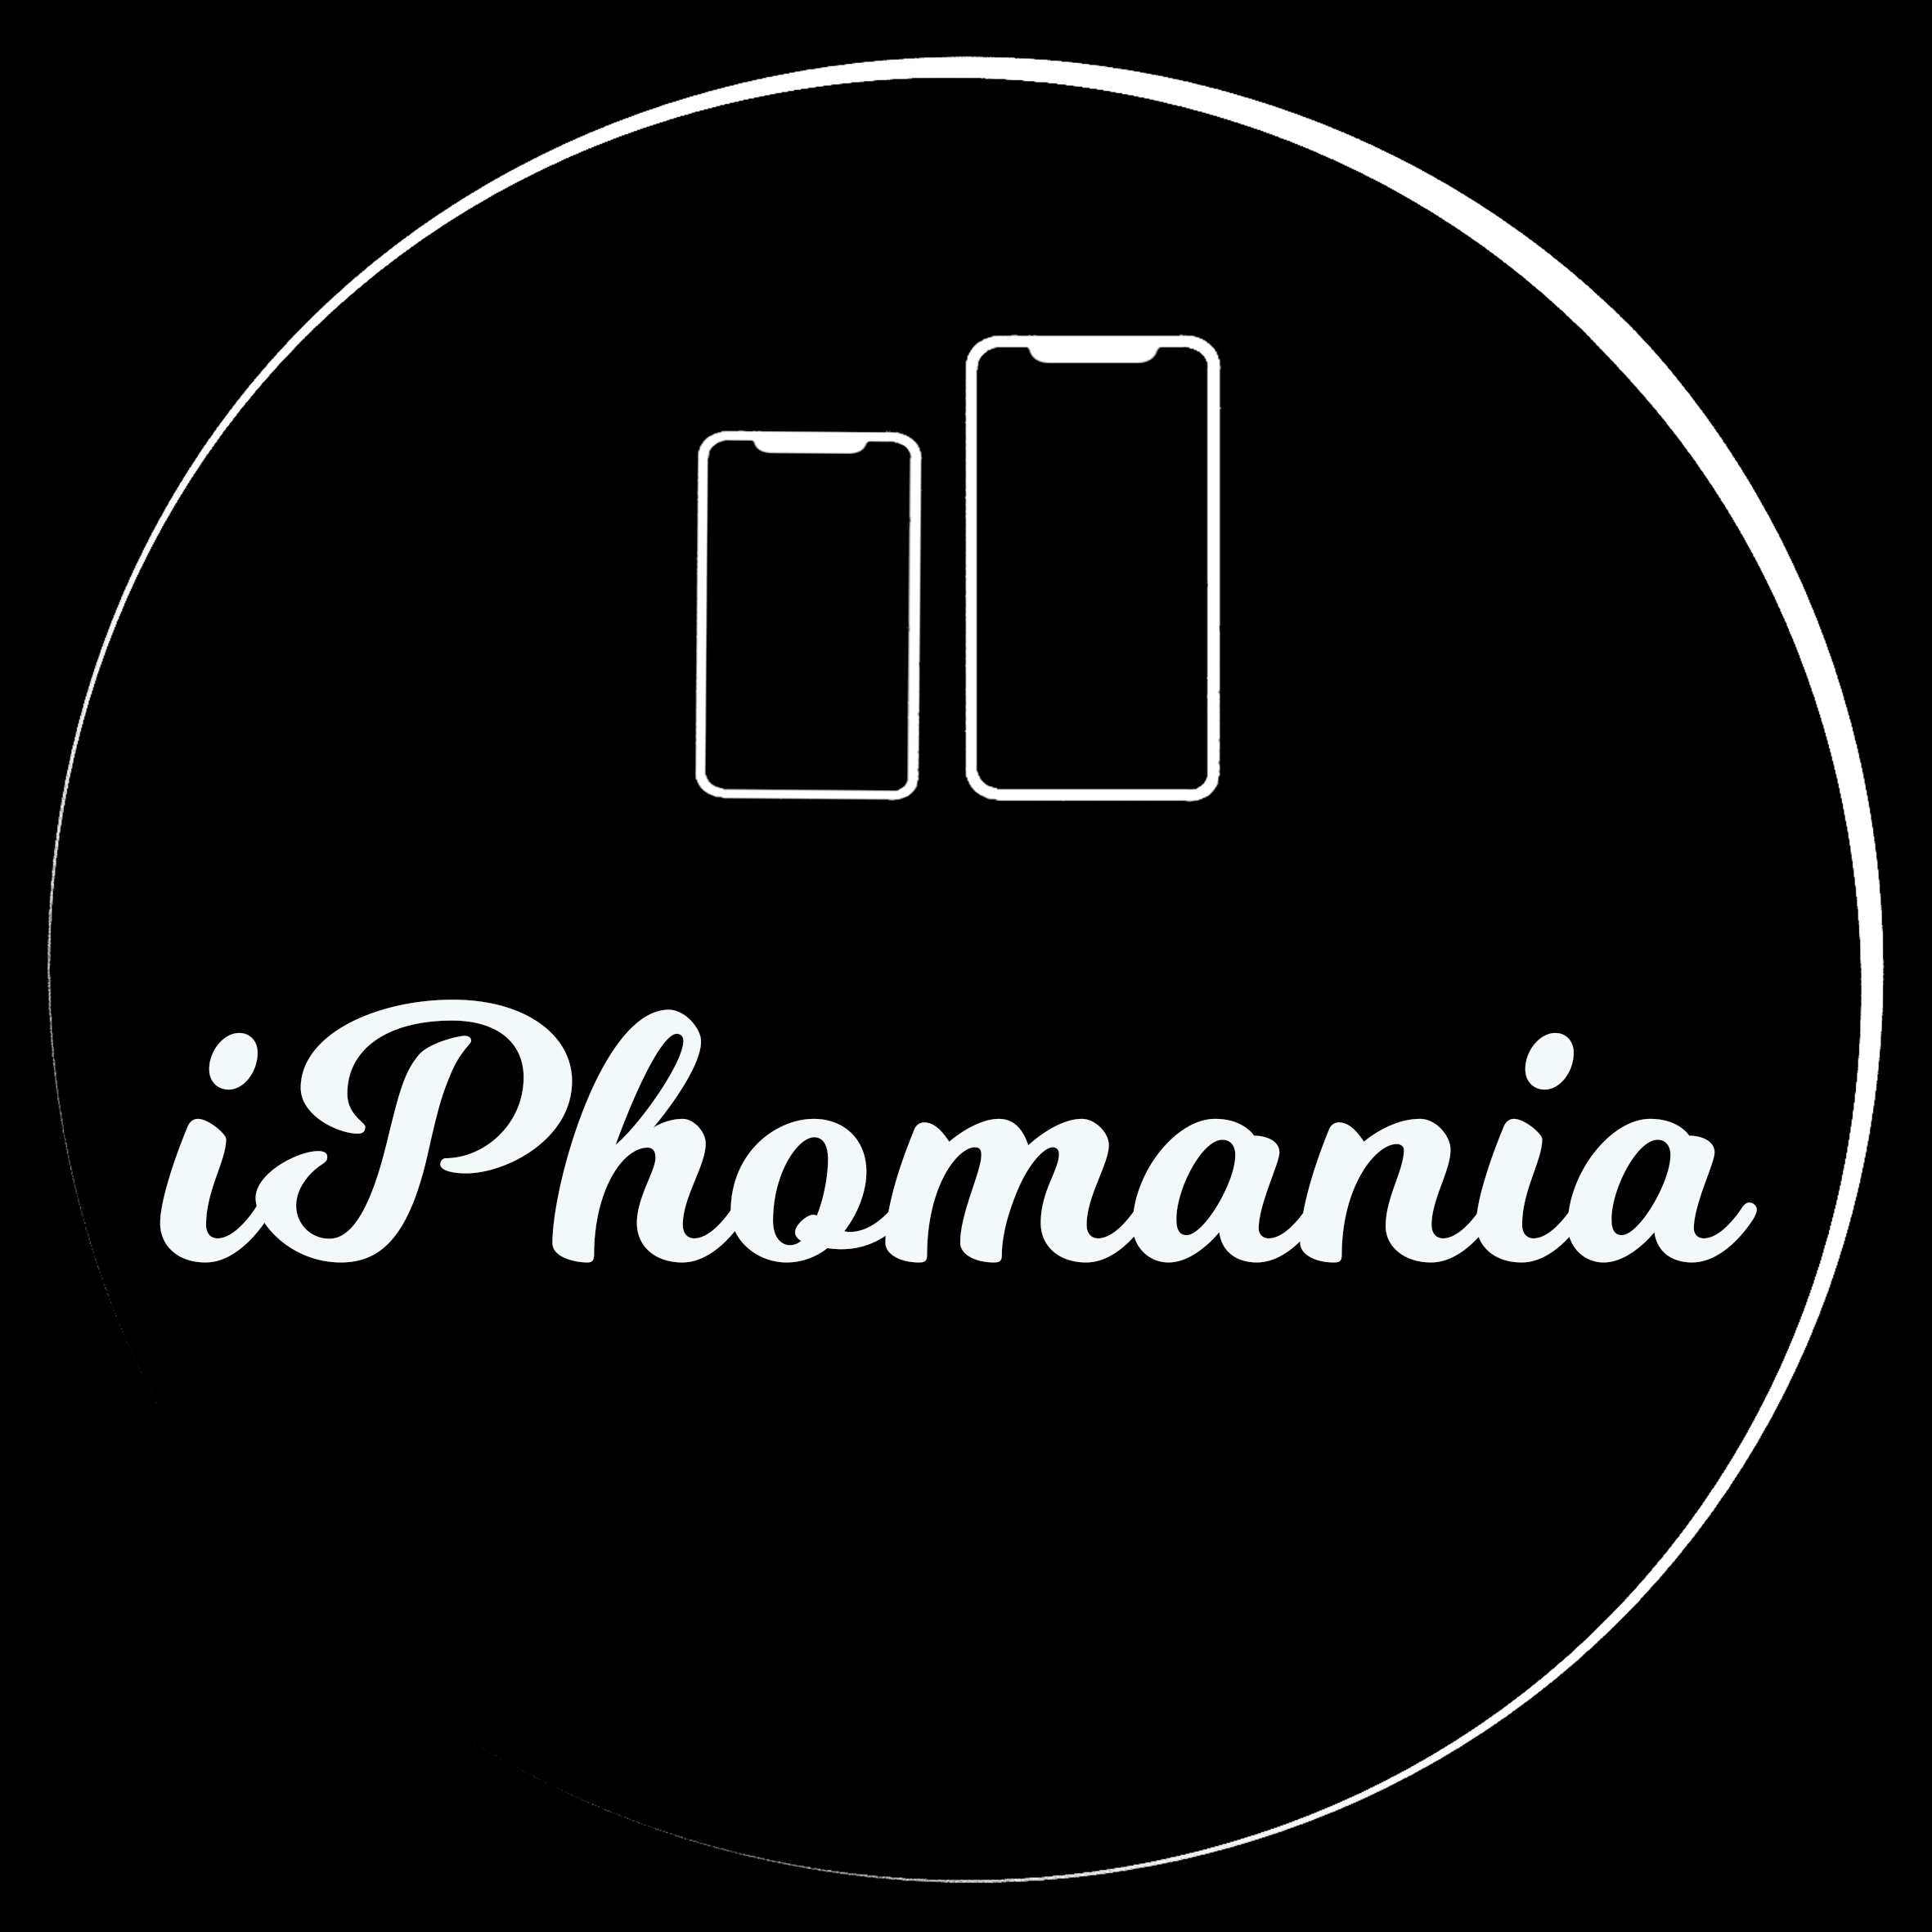 iPhomania